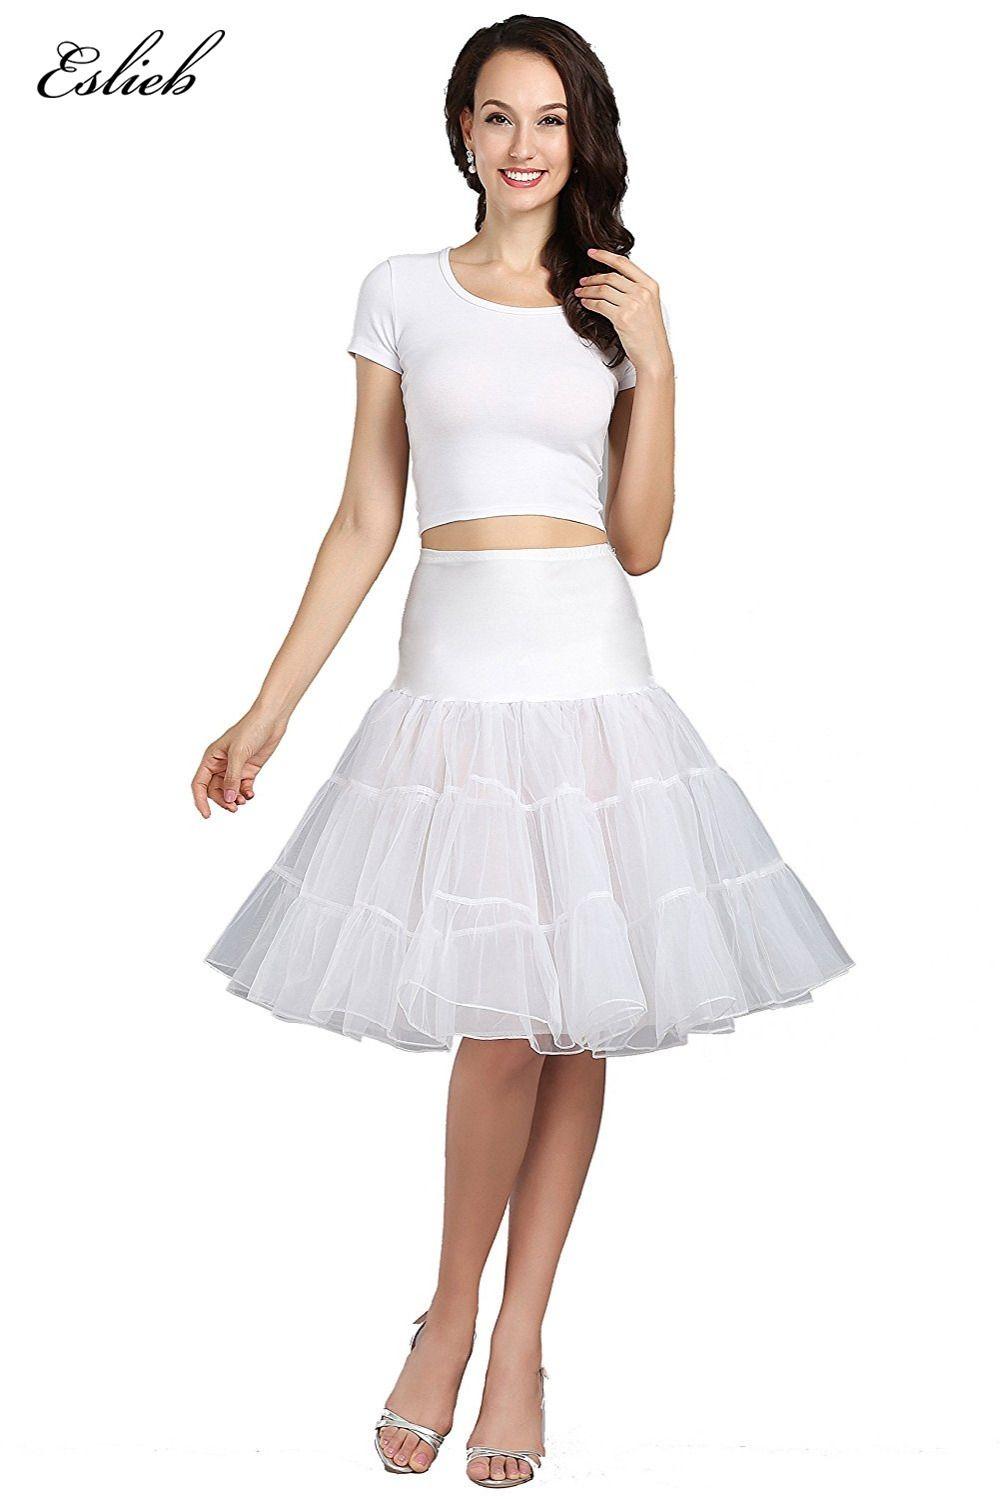 Eslieb Free Short Organza Petticoat Crinoline Vintage Wedding Bridal For Dresses Underskirt Rockabilly Tutu: Vintage Wedding Dresses Short Tutu At Websimilar.org